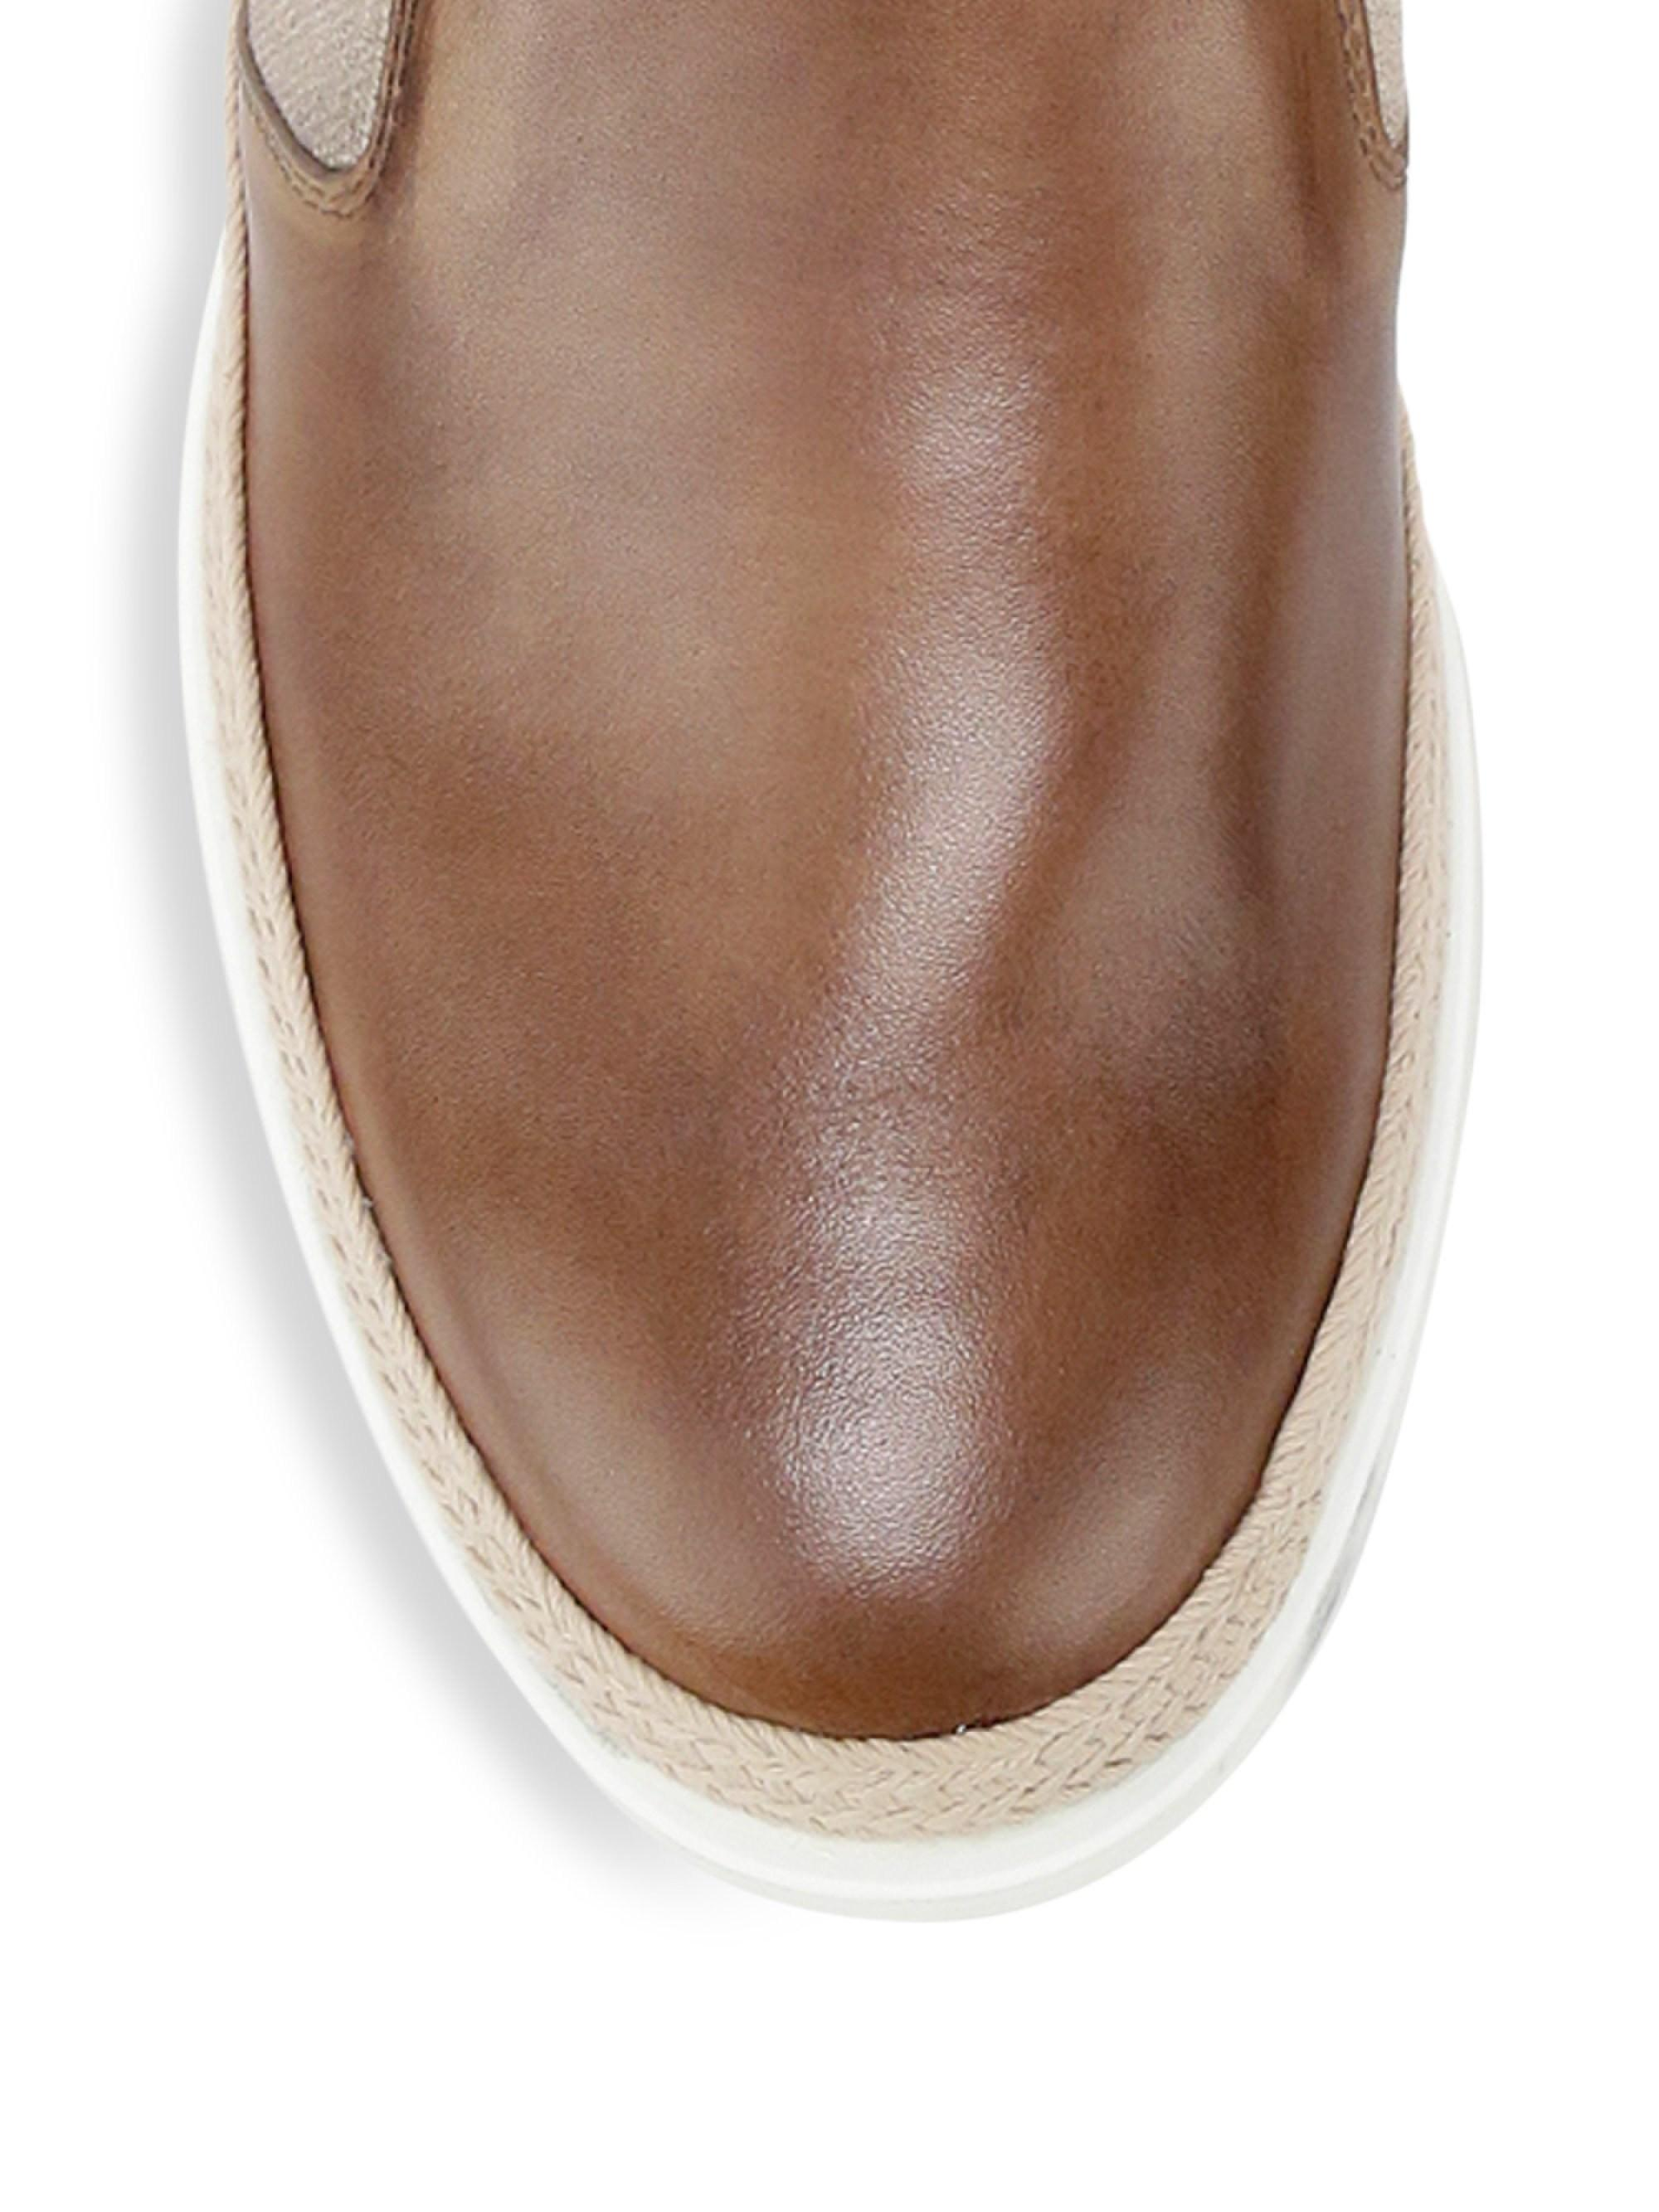 244f3f2af9a Lyst - Tod s Men s Leather Espadrille Slip-on Shoes - Caramel Brown - Size  12 Uk (13 Us) in Brown for Men